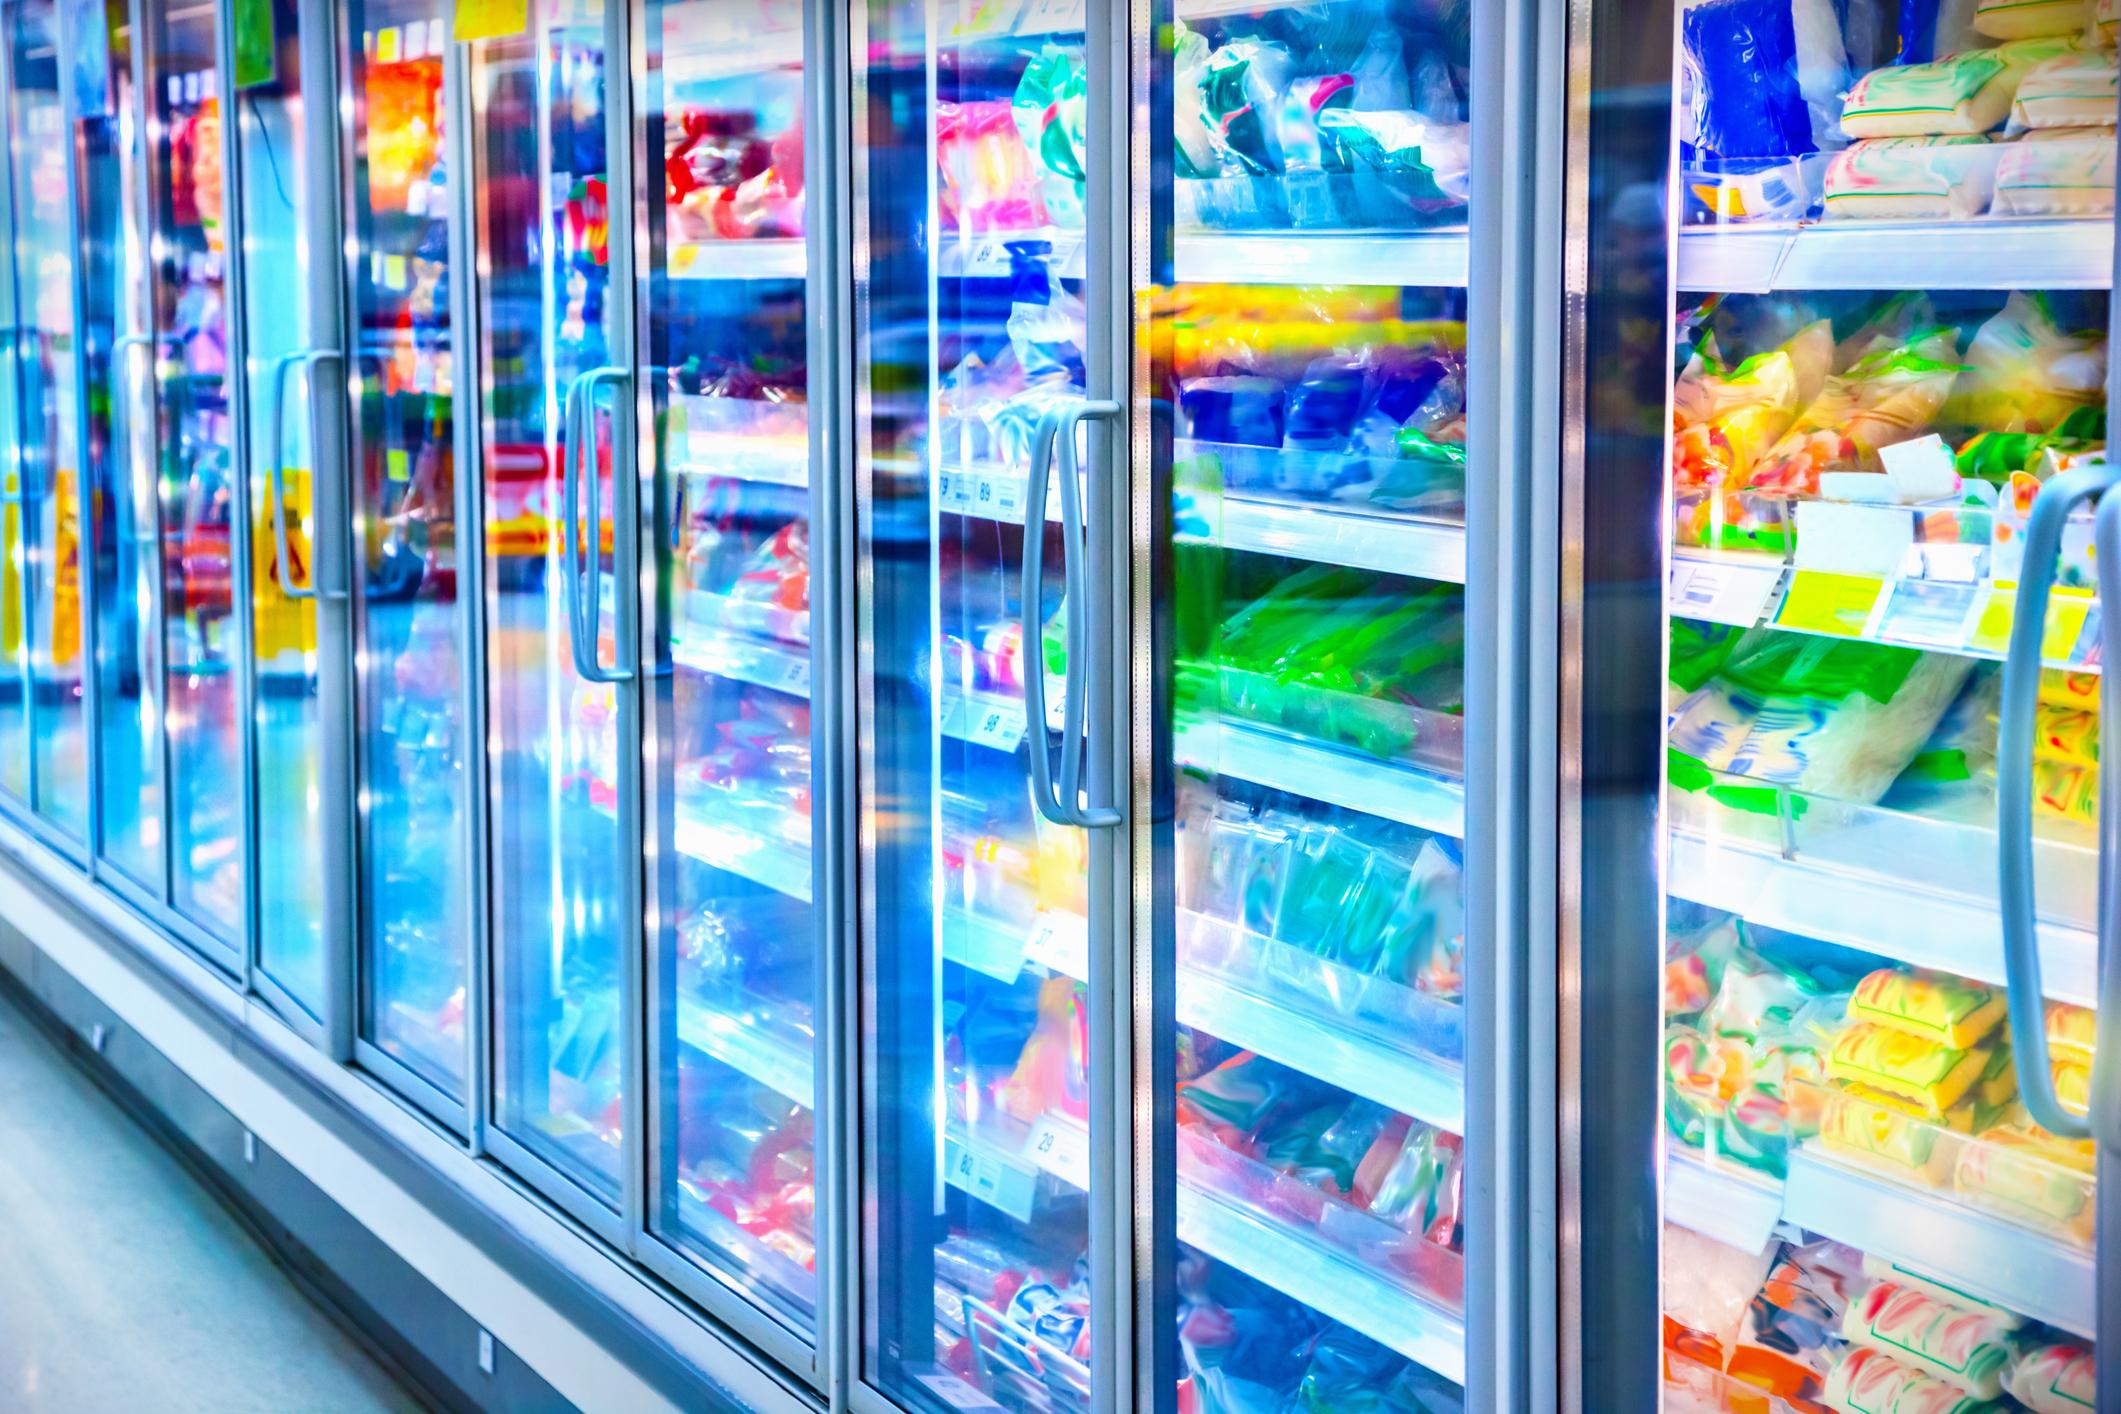 Frozen food aisle of a supermarket